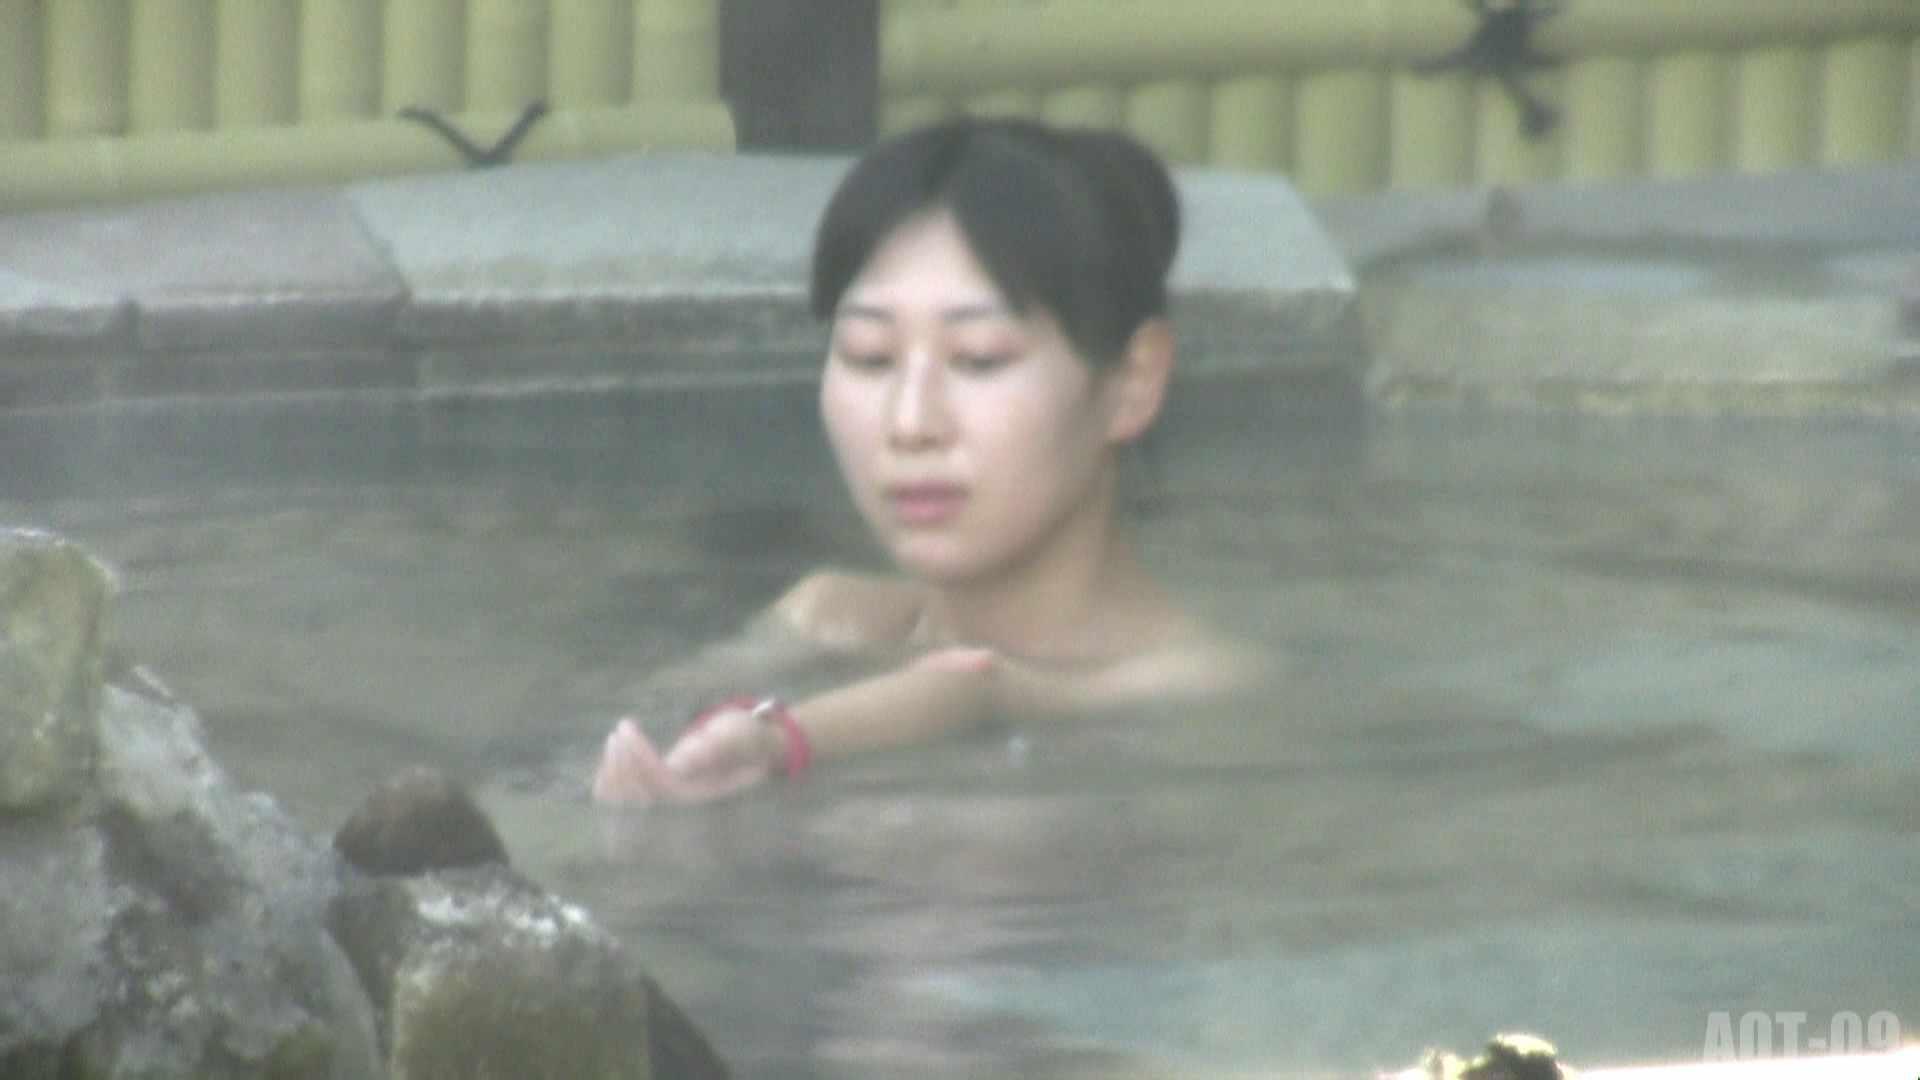 Aquaな露天風呂Vol.785 露天風呂編  110PIX 34